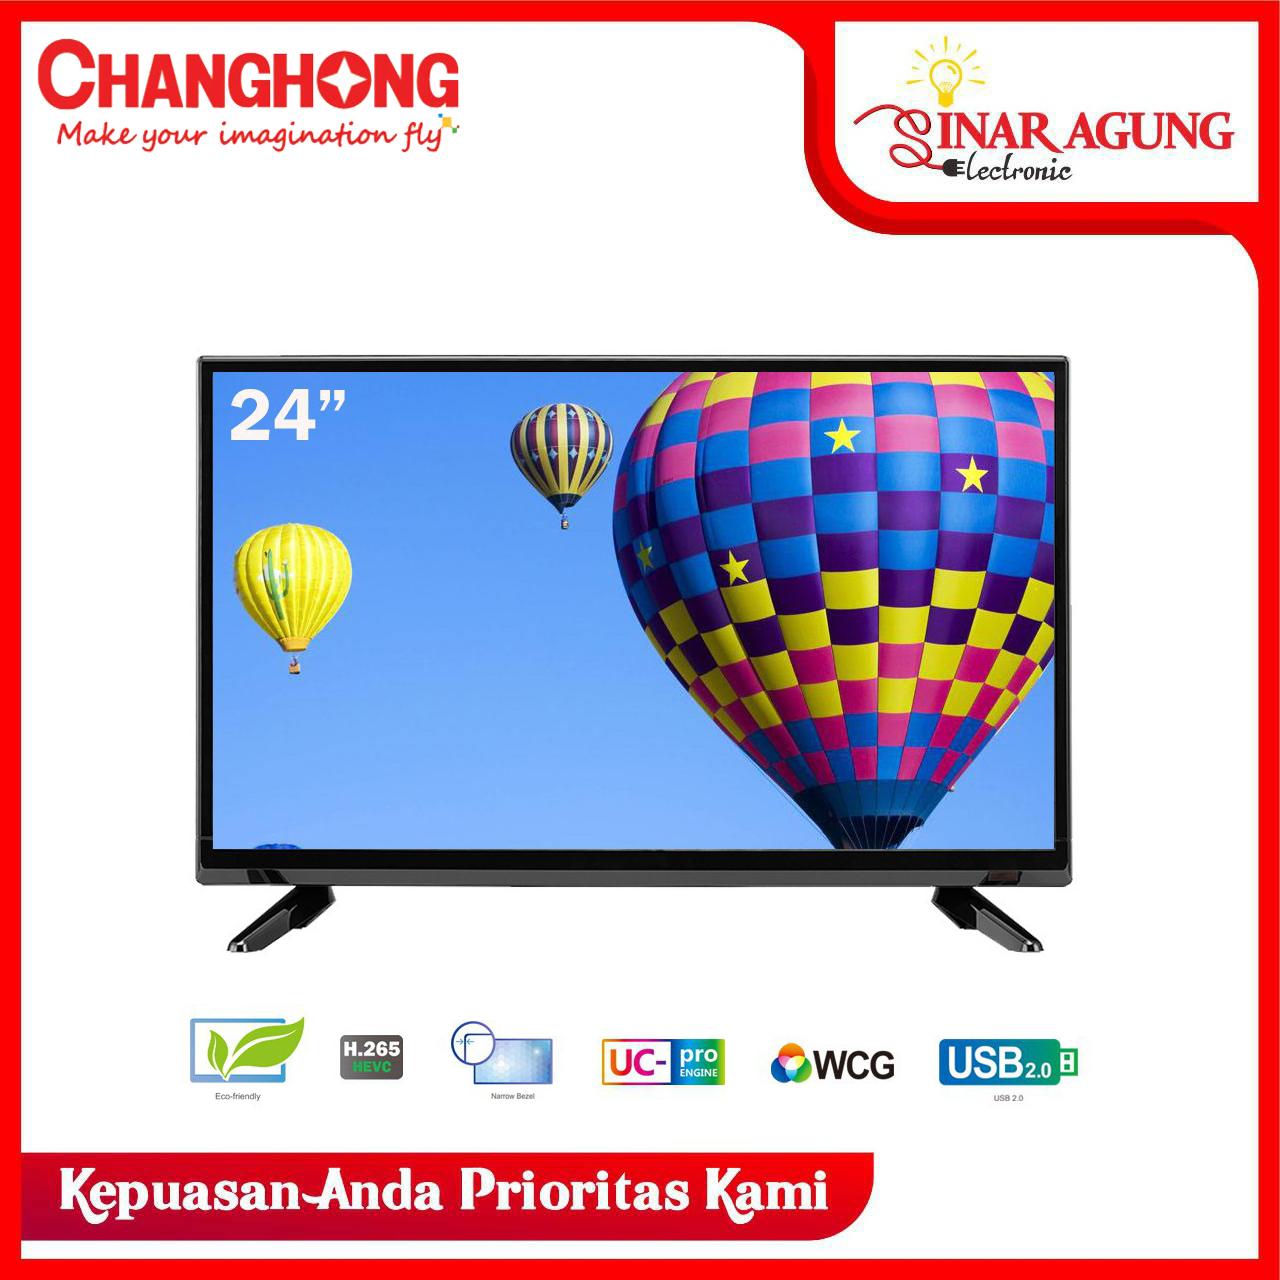 Changhong 24 Inch LED TV HD TV (Model : L24G3) HDMI - USB Movie - Garansi Resmi 3 Tahun